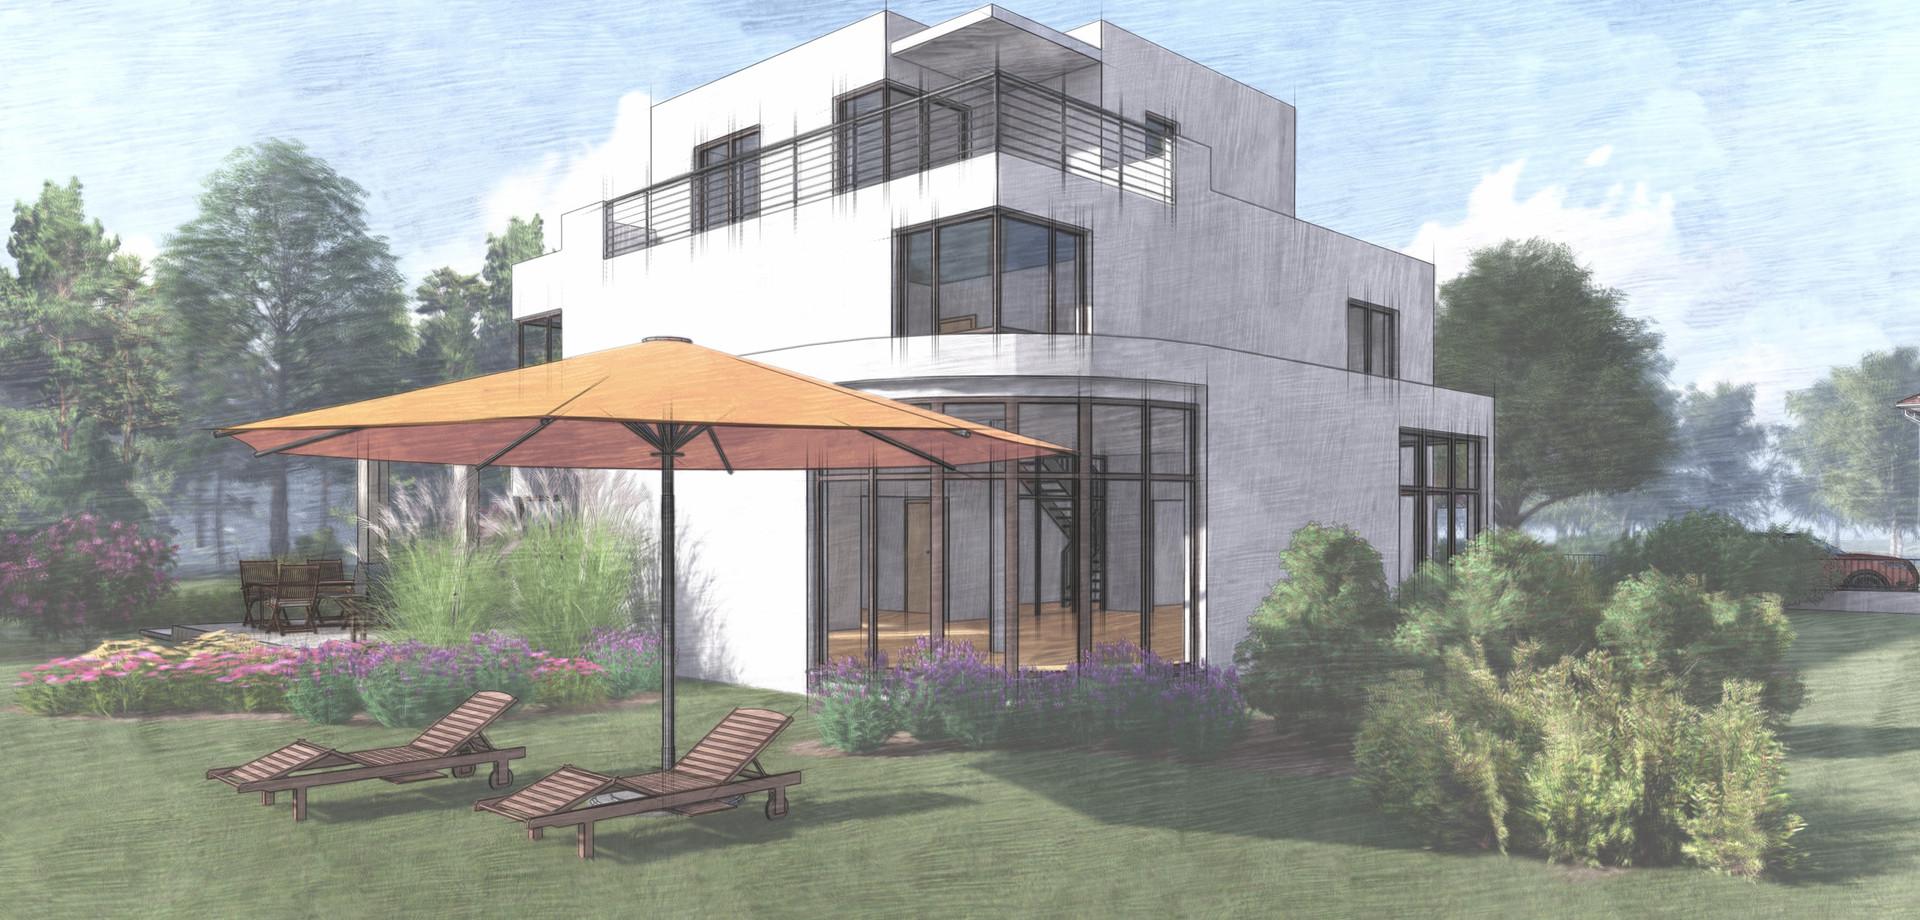 Entwurf Stadtvilla Spindlersfeld